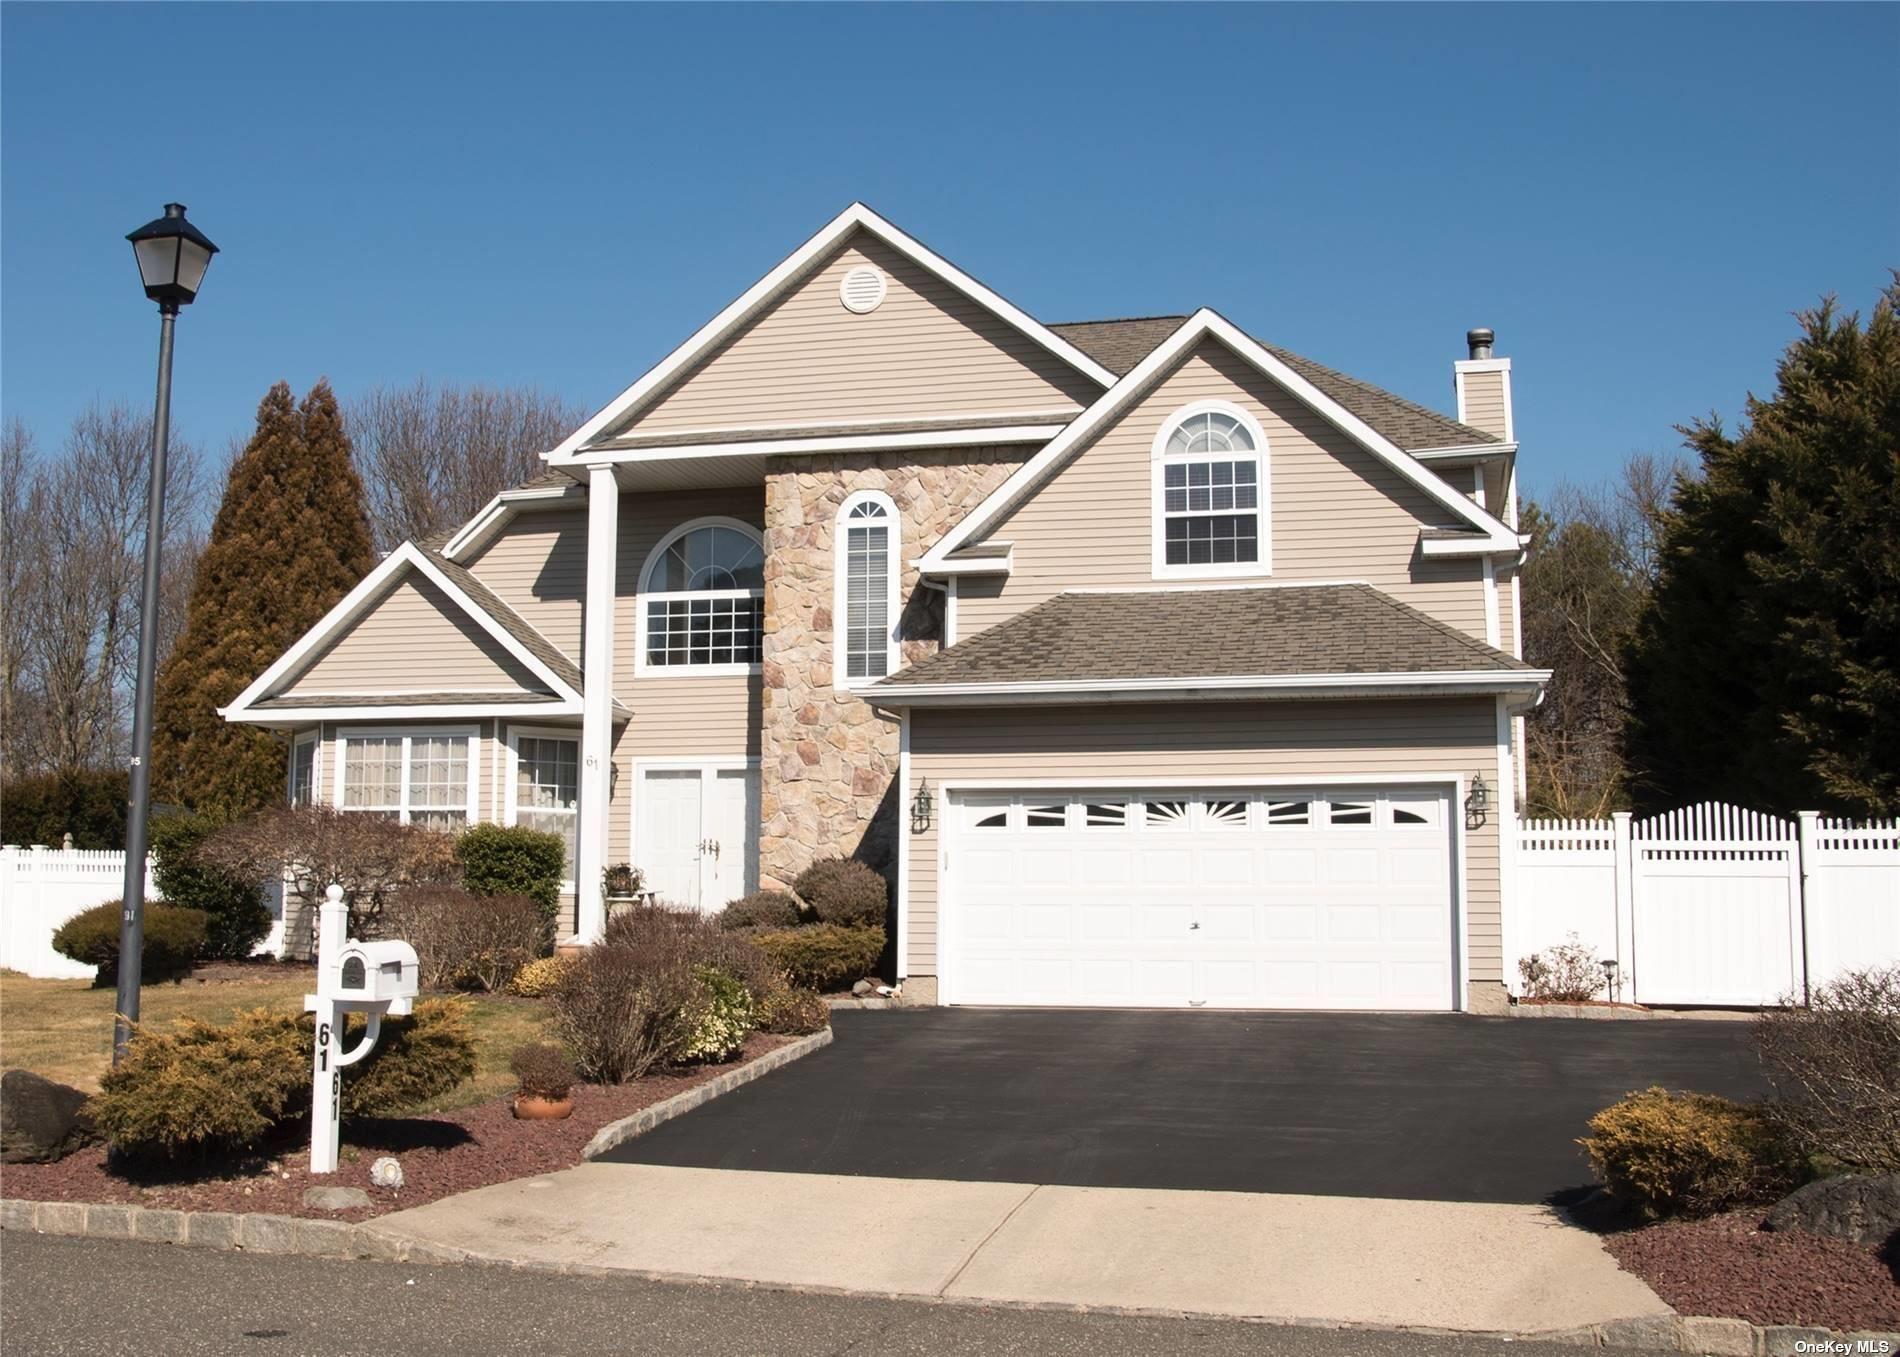 61 Summerfield Drive, Holtsville, NY 11742 - MLS#: 3296197